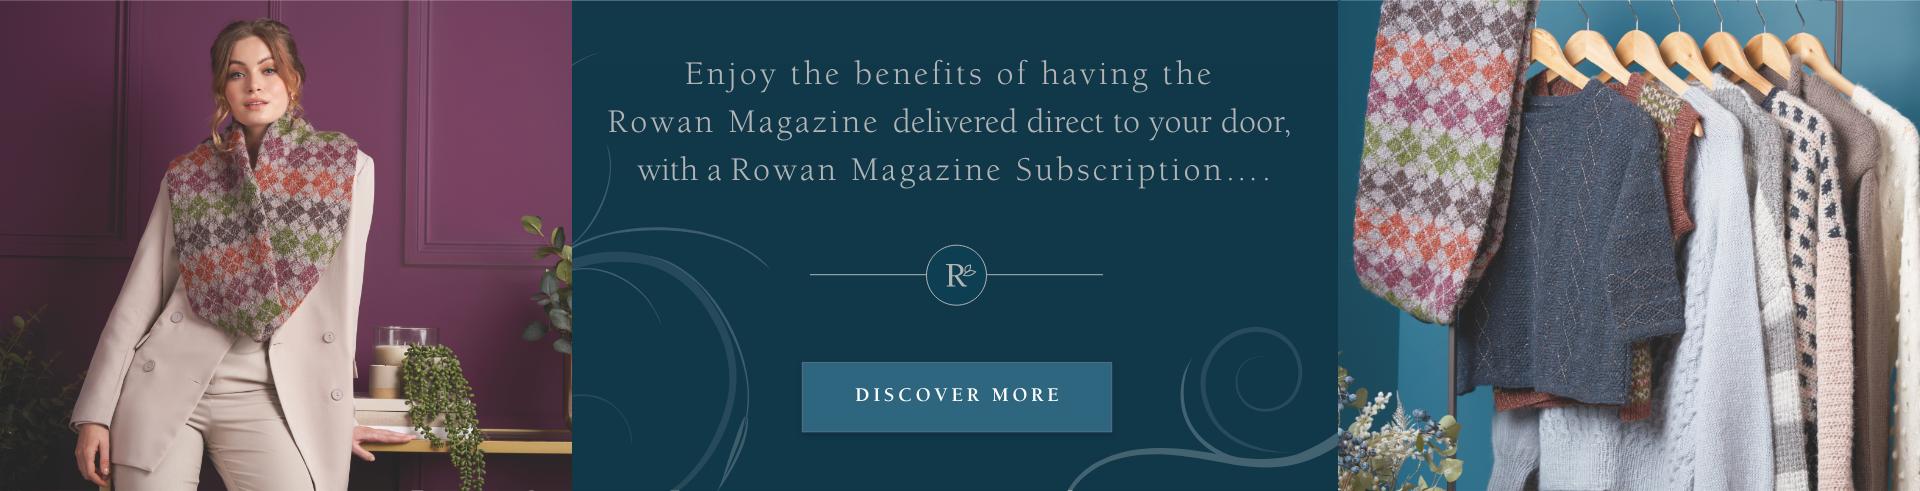 Rowan Subscription Promo Mag 70_2